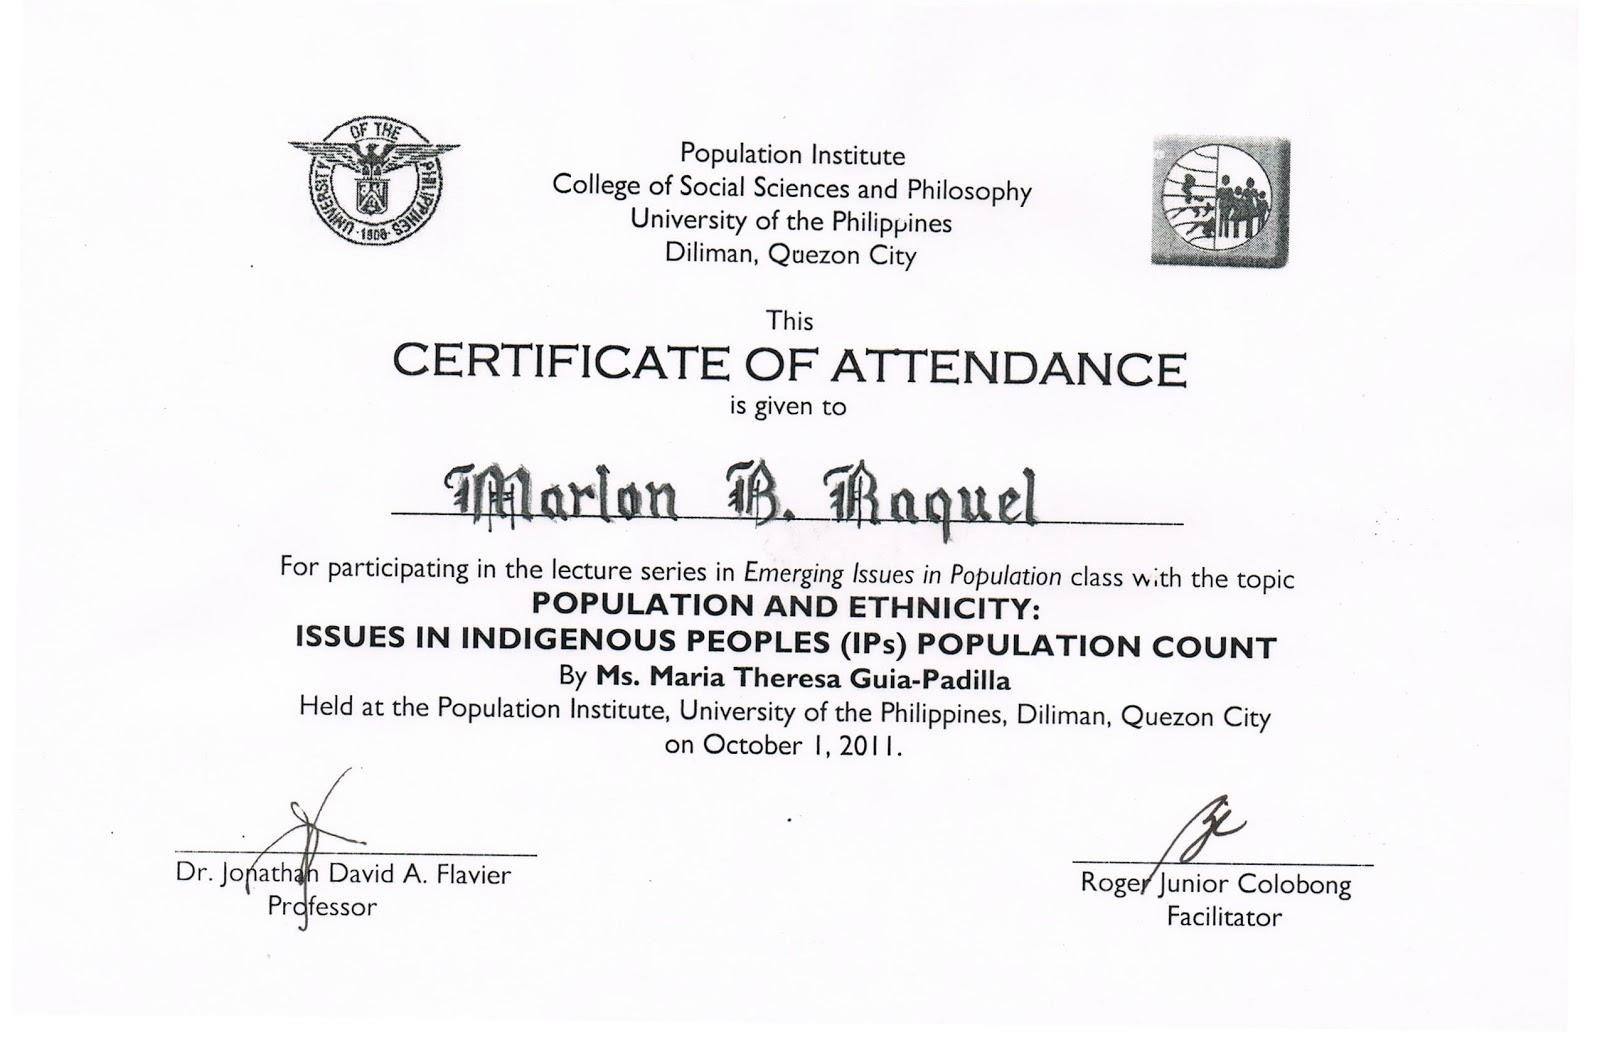 attendance certificates printable – Attendance Certificates Printable